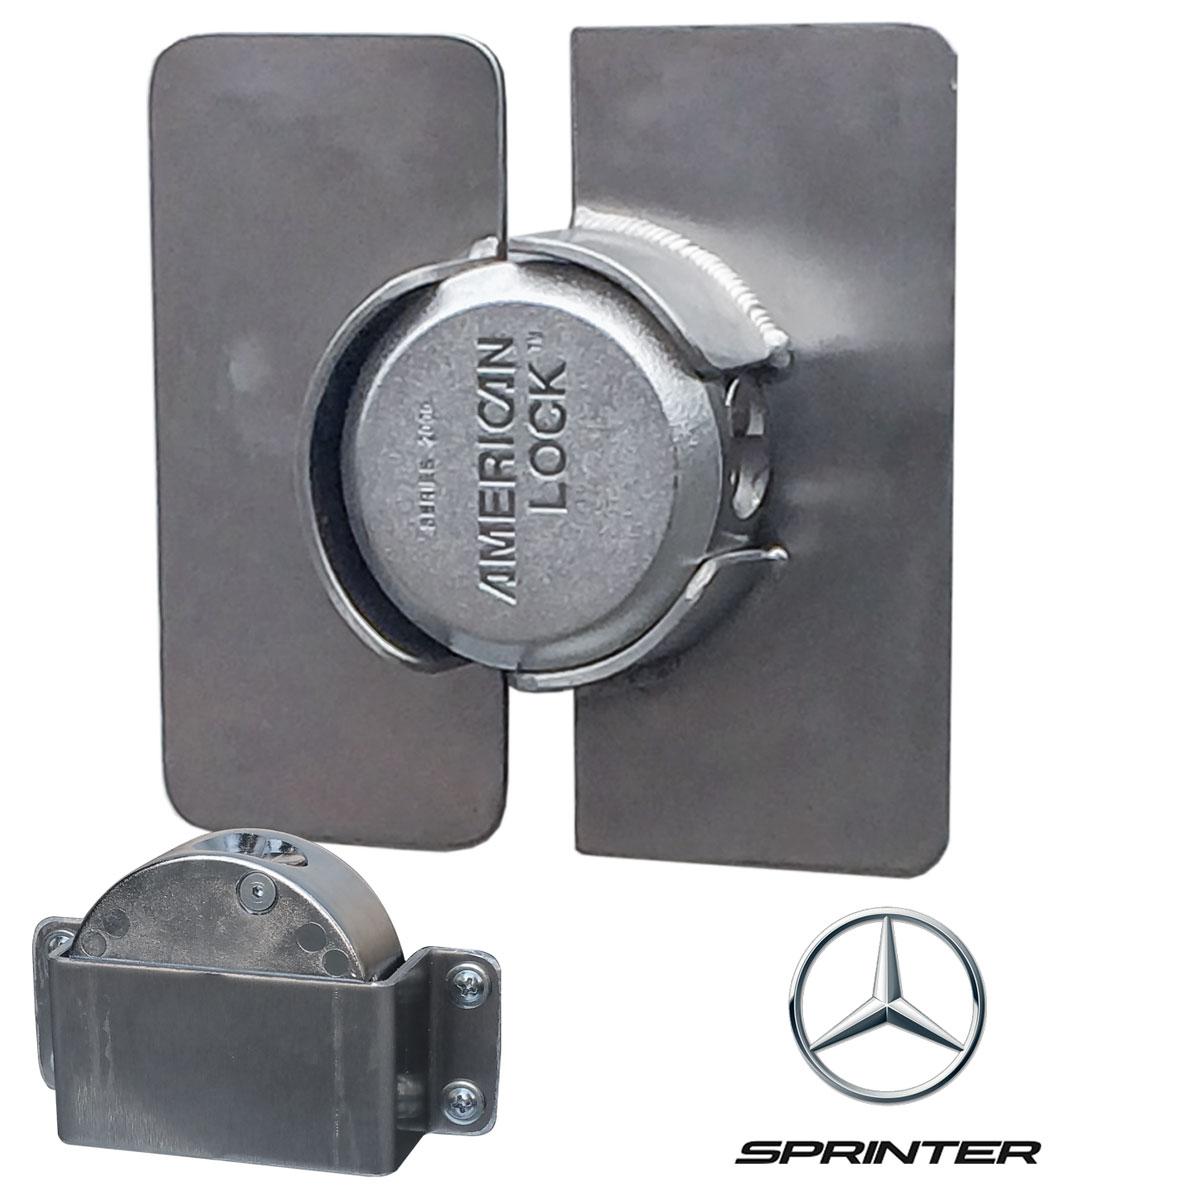 2007+ SprinterPuck Lock Kit Driver DoorSKU: 170029